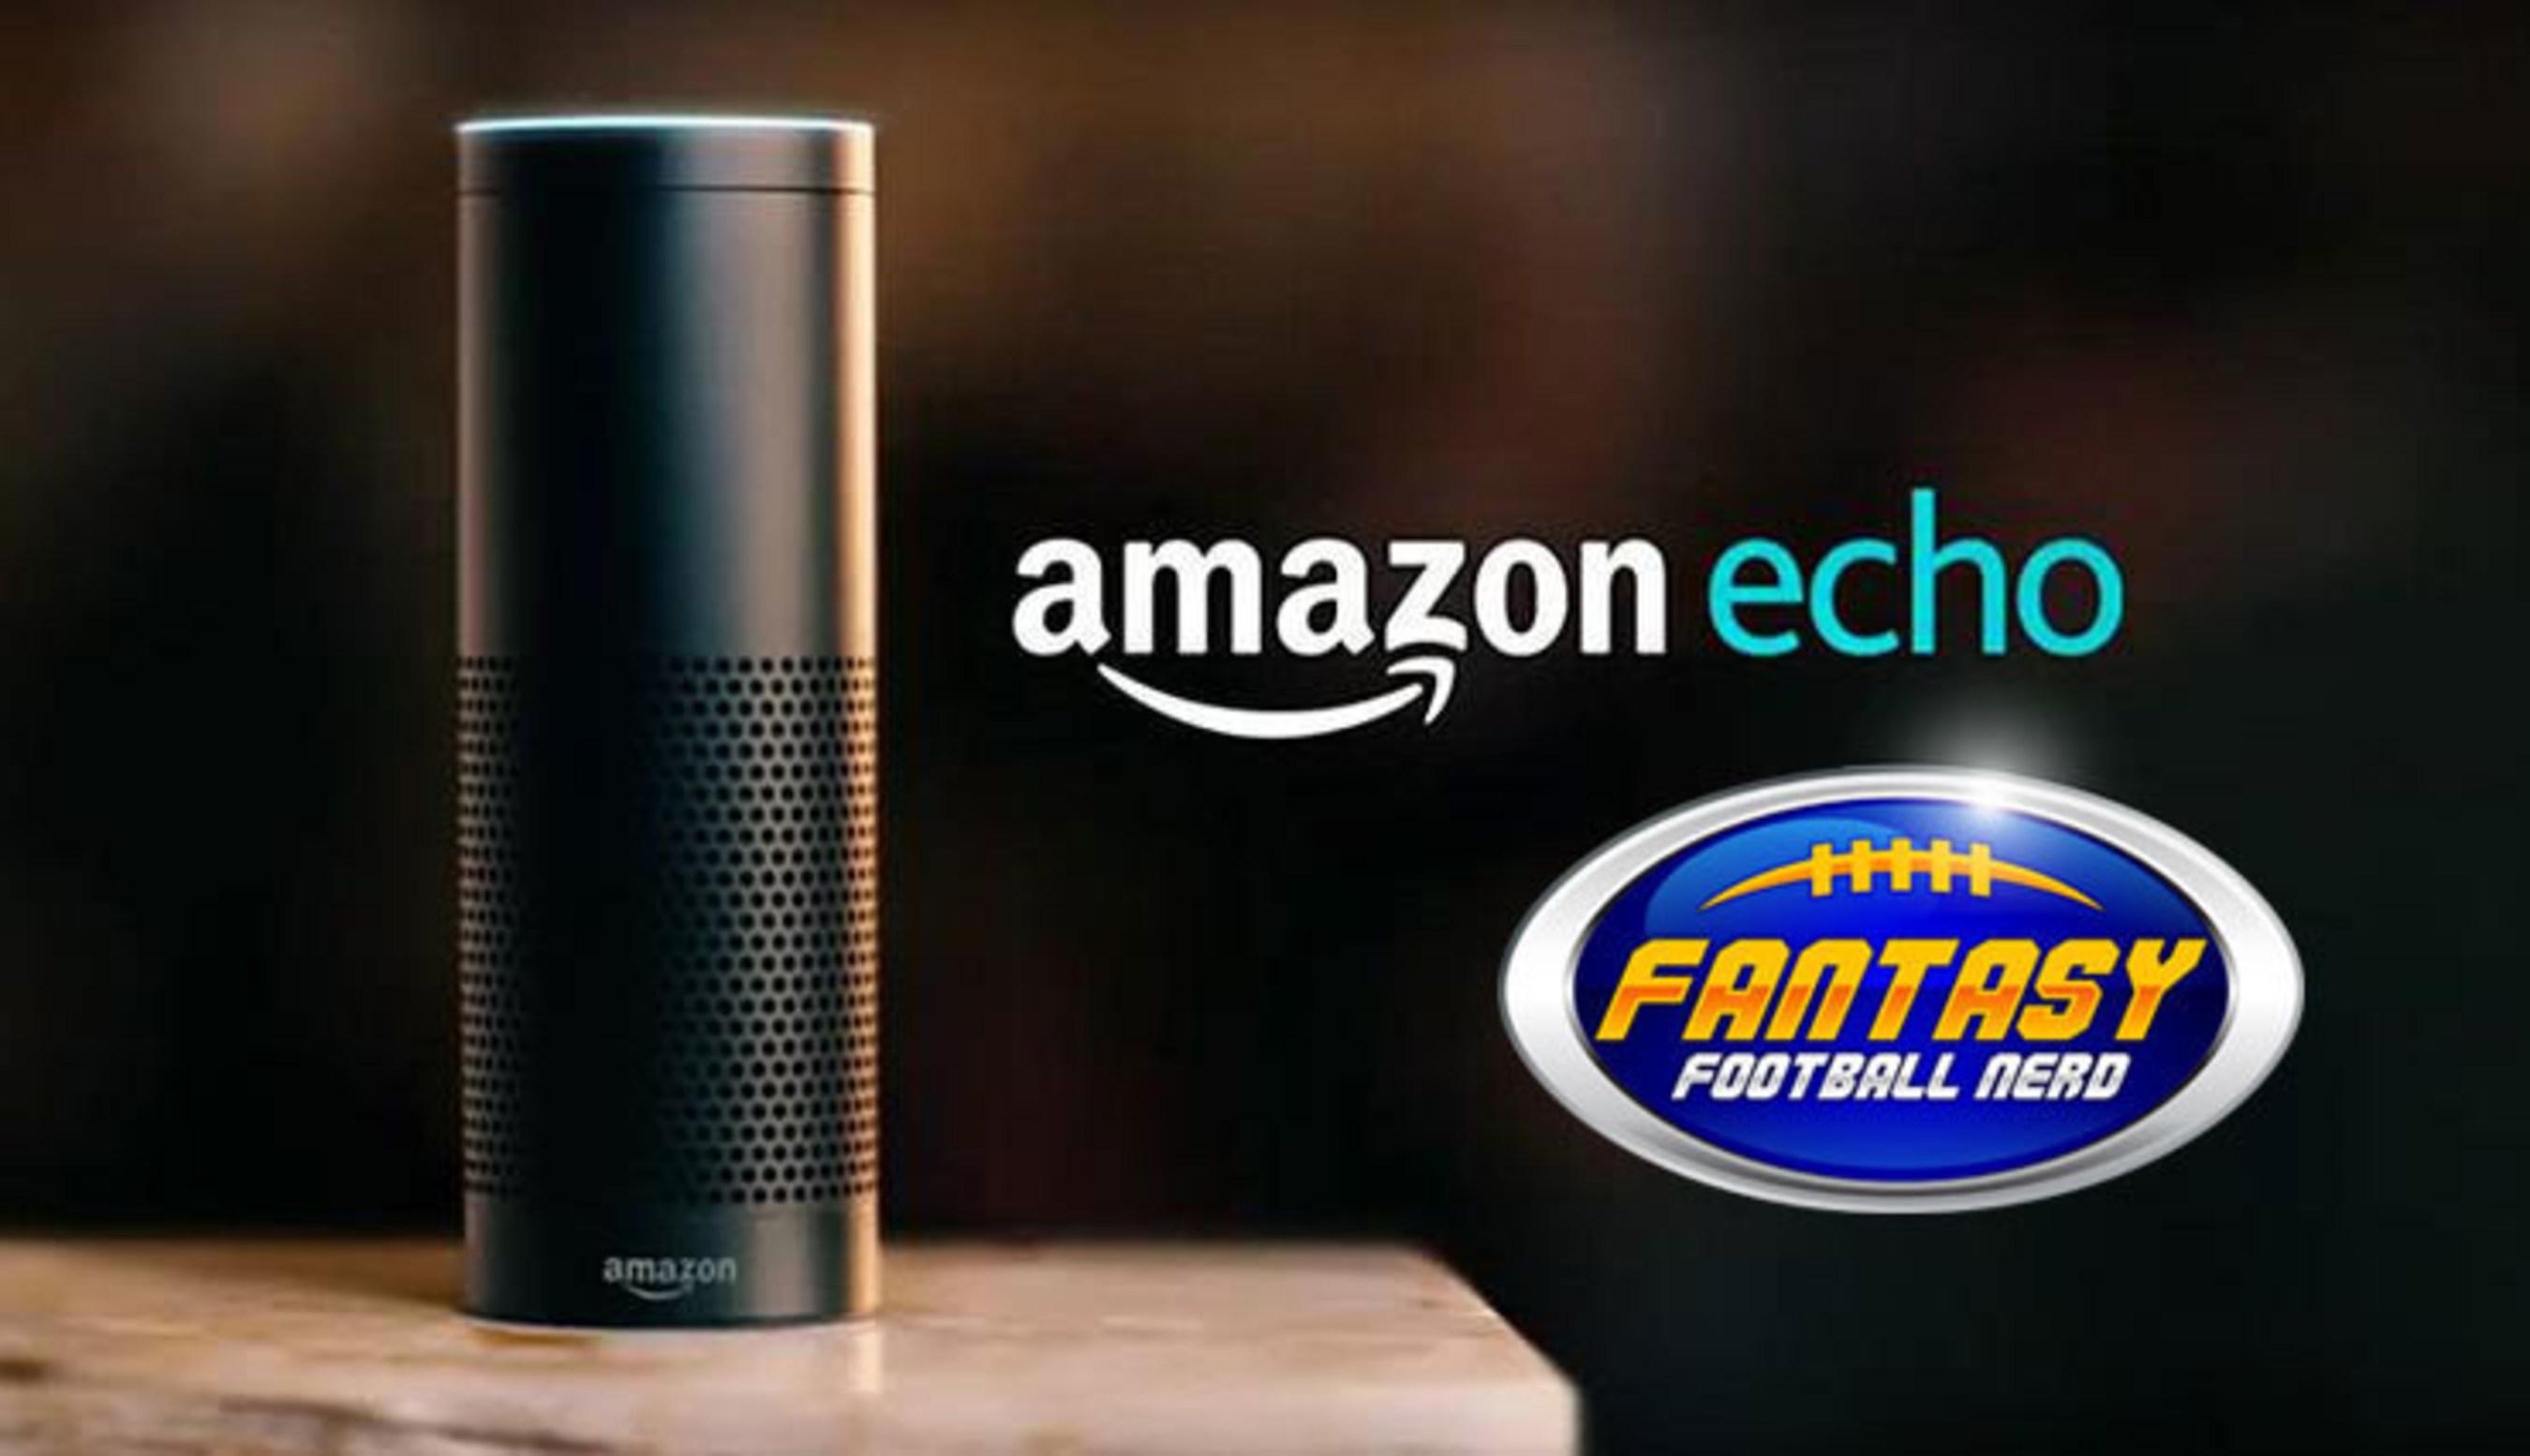 Fantasy Football Nerd Announces Integration With Amazon Echo